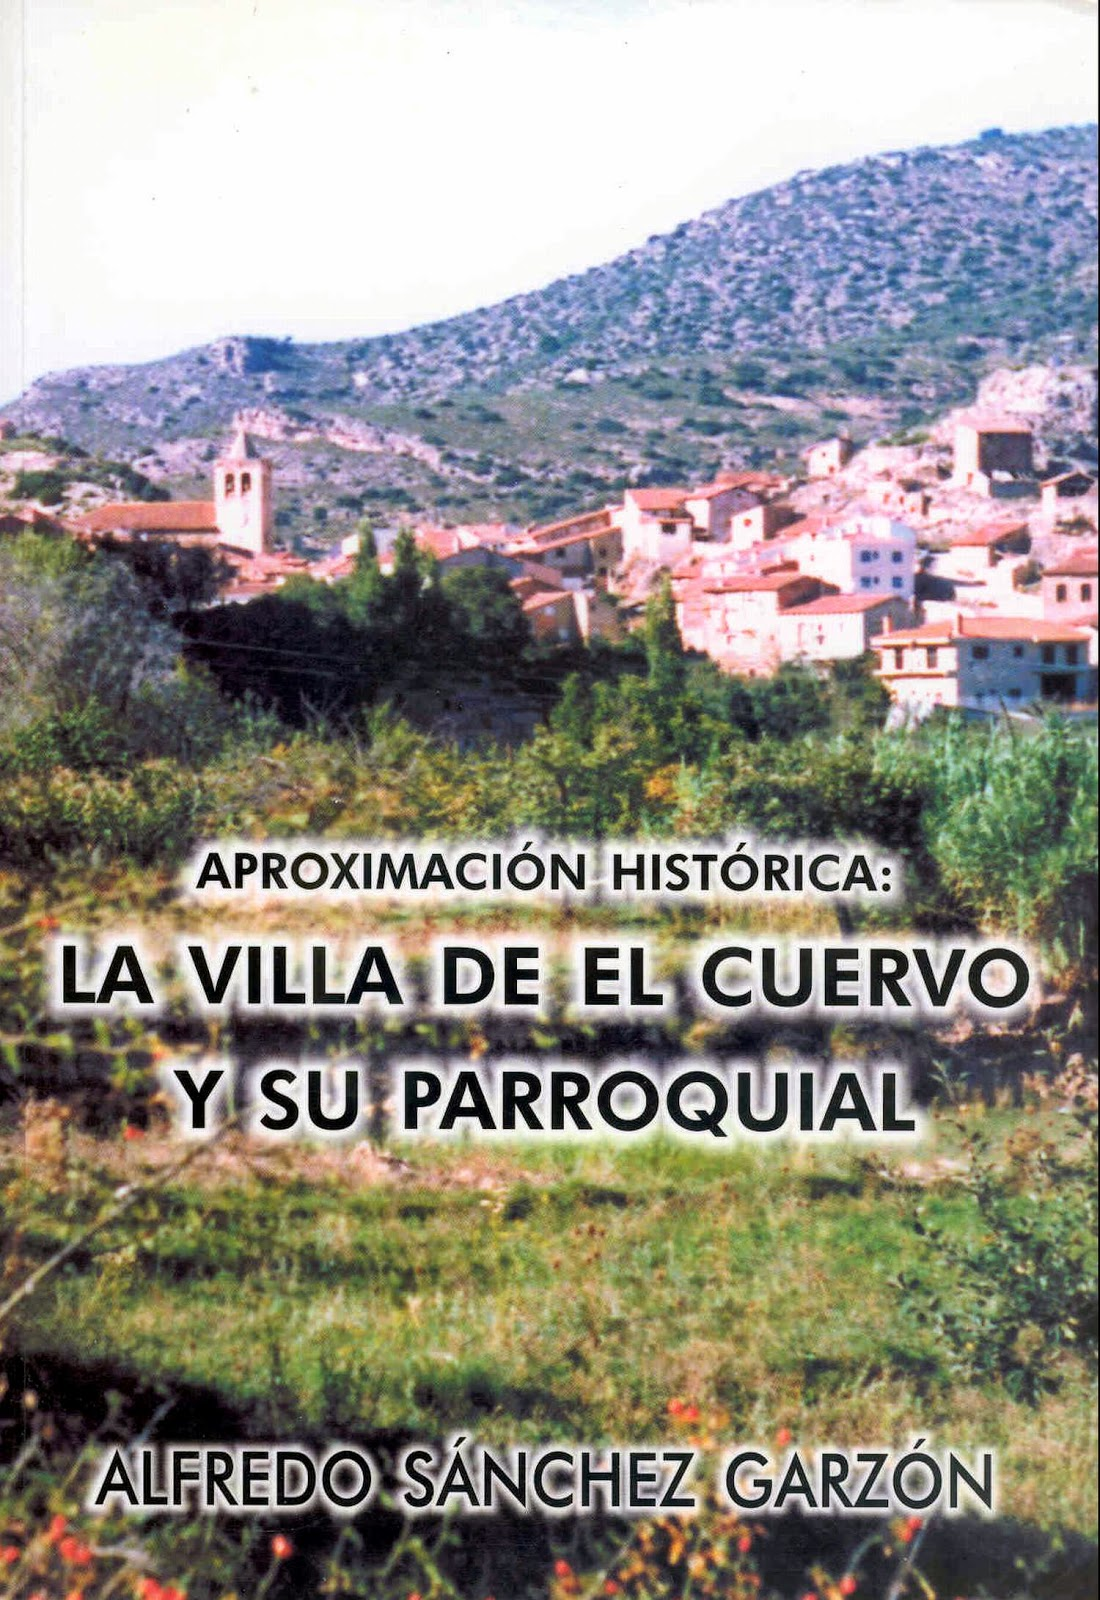 villa-cuervo-parroquial-alfredo-sanchez-garzon